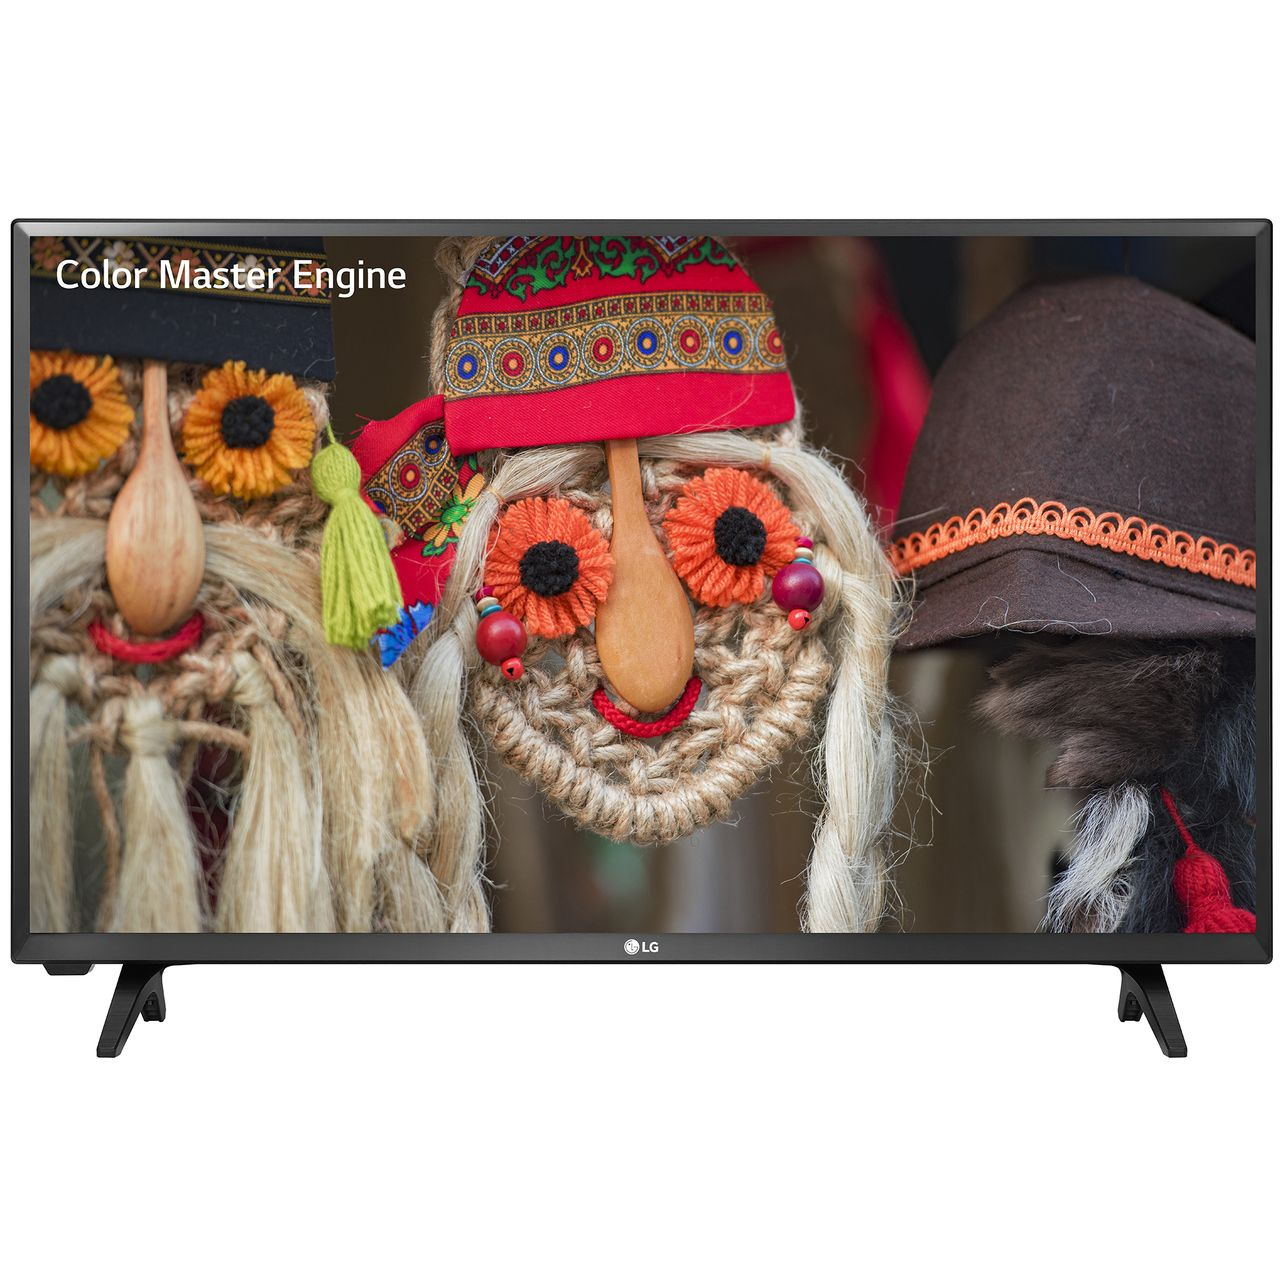 Televizor LED LG 32LJ500U 80cm HD Ready Negru